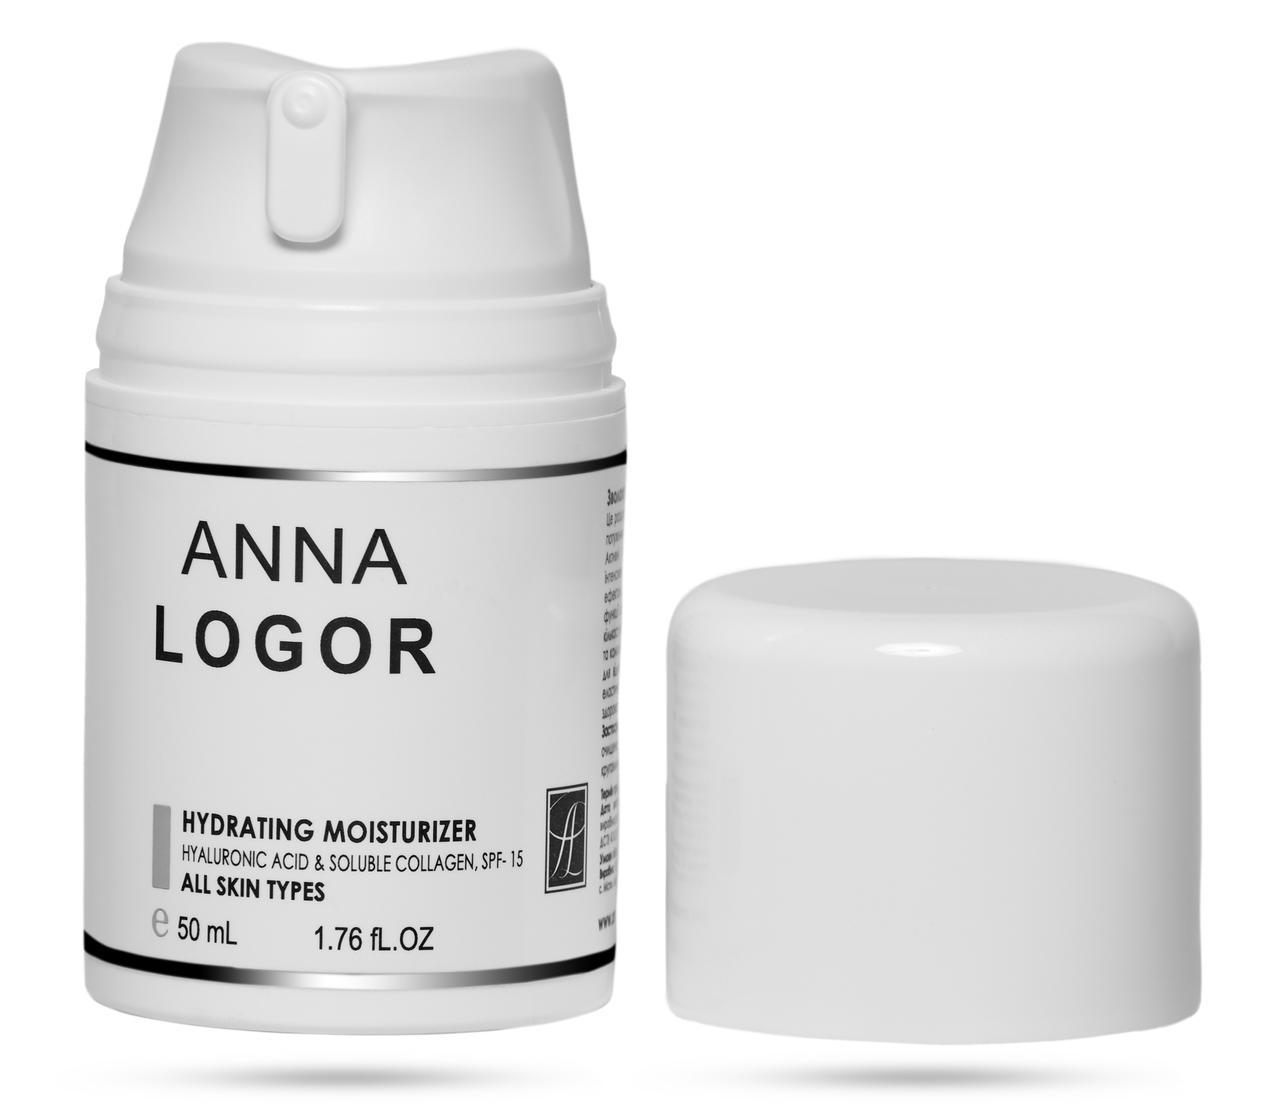 Крем увлажняющий для всех типов кожи Anna LOGOR Hydrating Moisturizer 50 ml Art.621